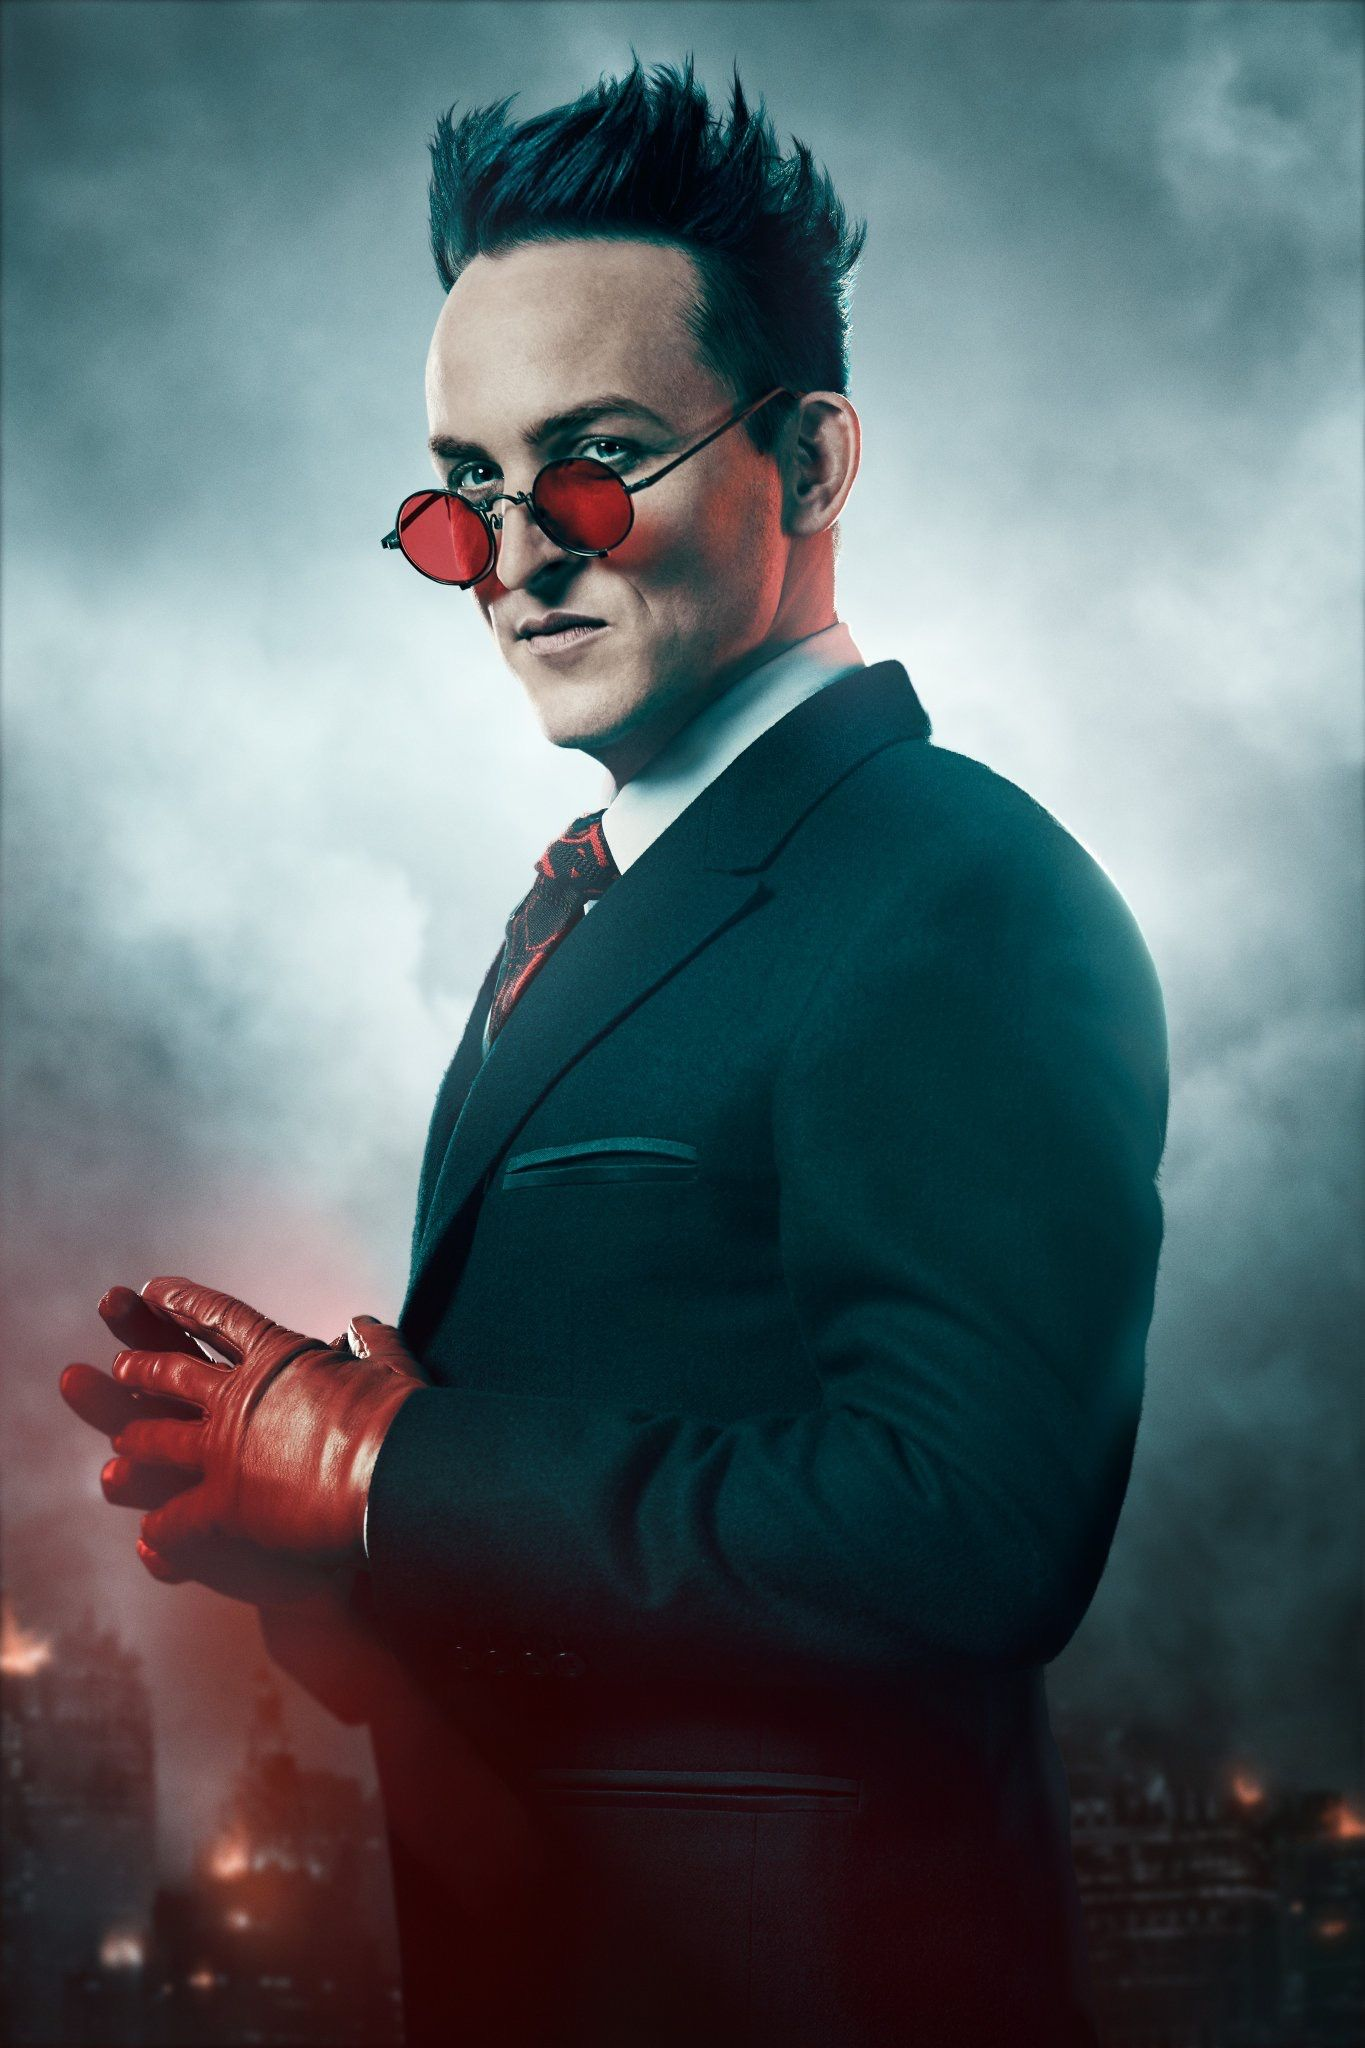 Gotham Season 5 cast photos (With images) Gotham cast